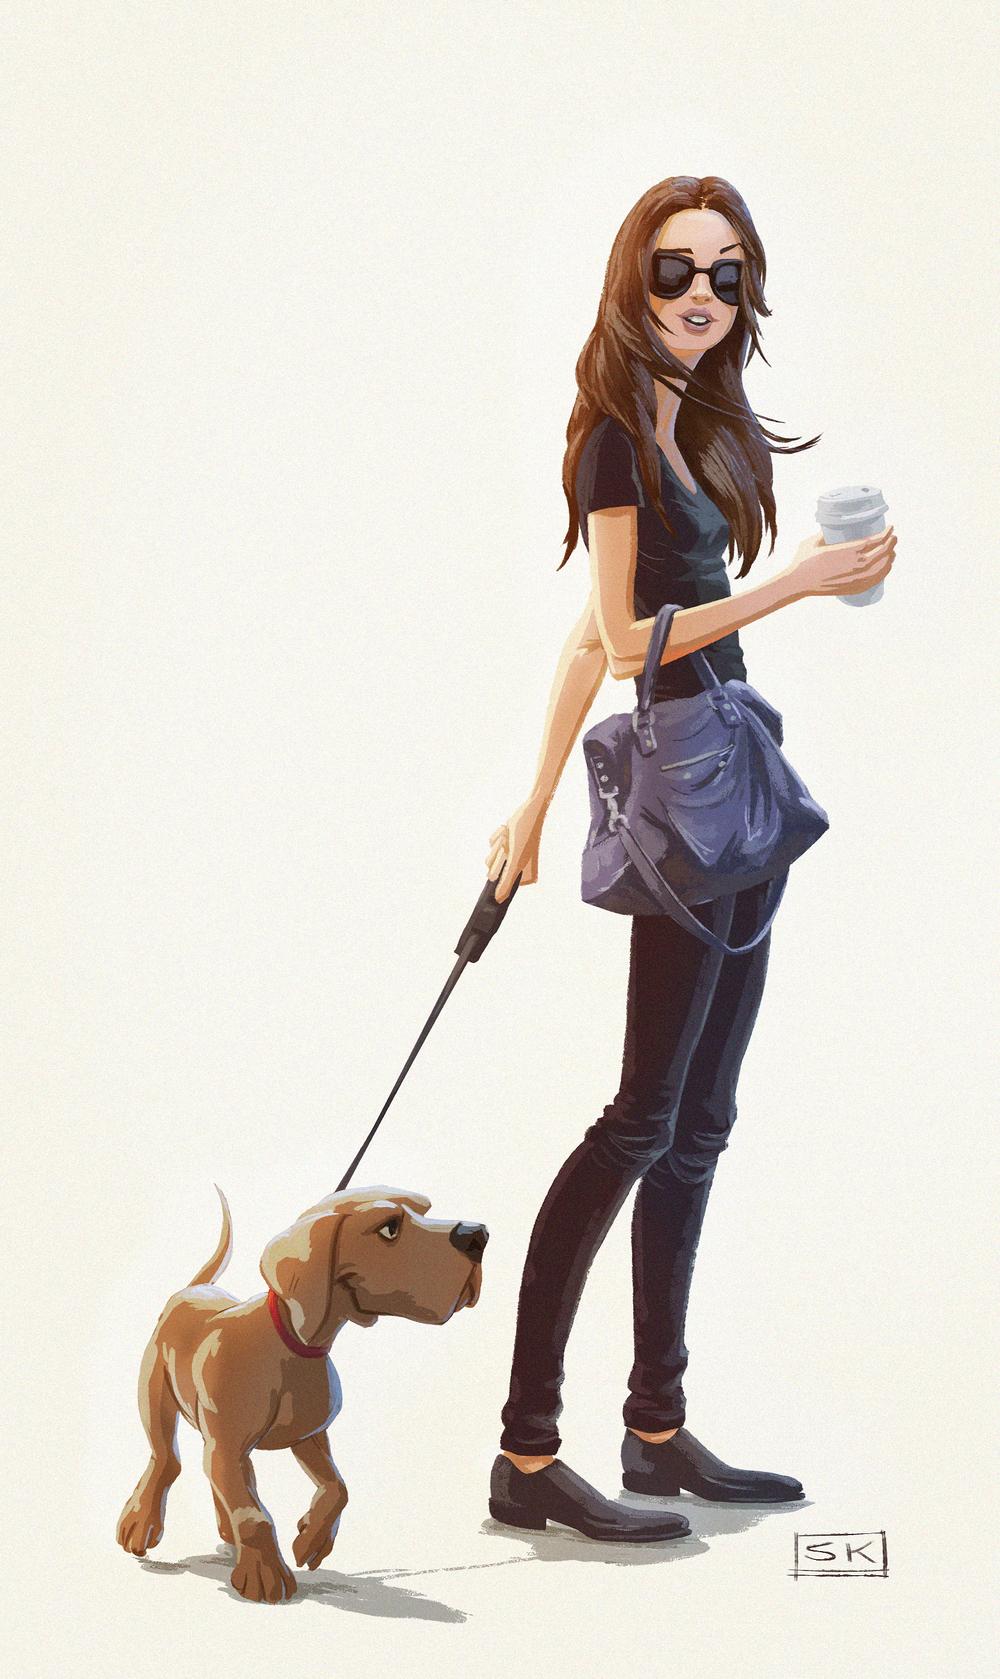 GirlwalkingDog.jpg